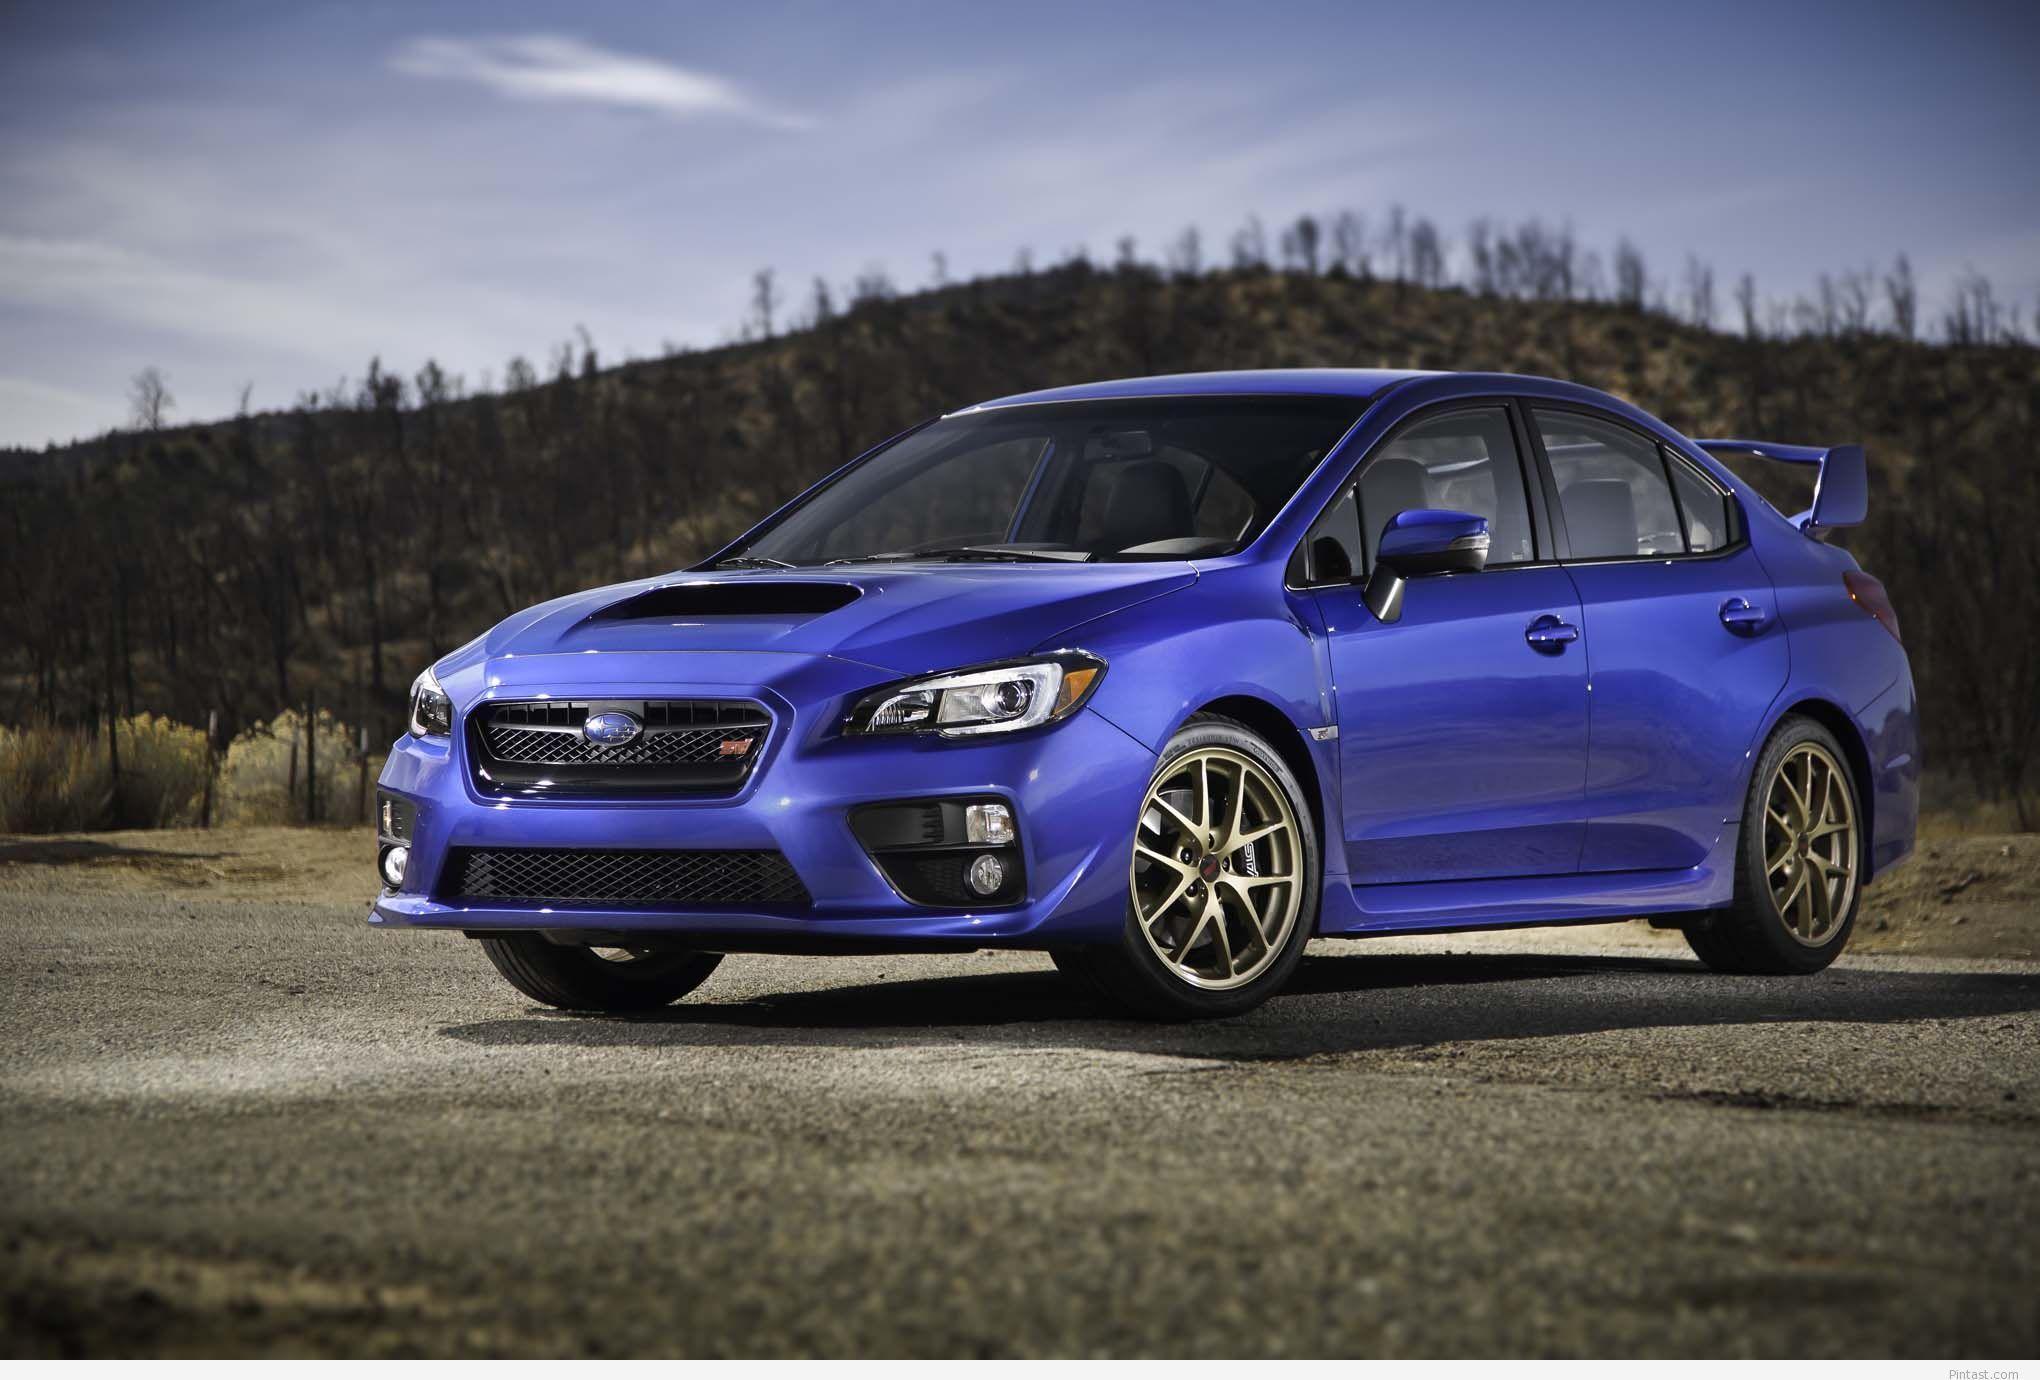 Wrx Sti 0 60 >> Subaru Sti 0 Veicolo